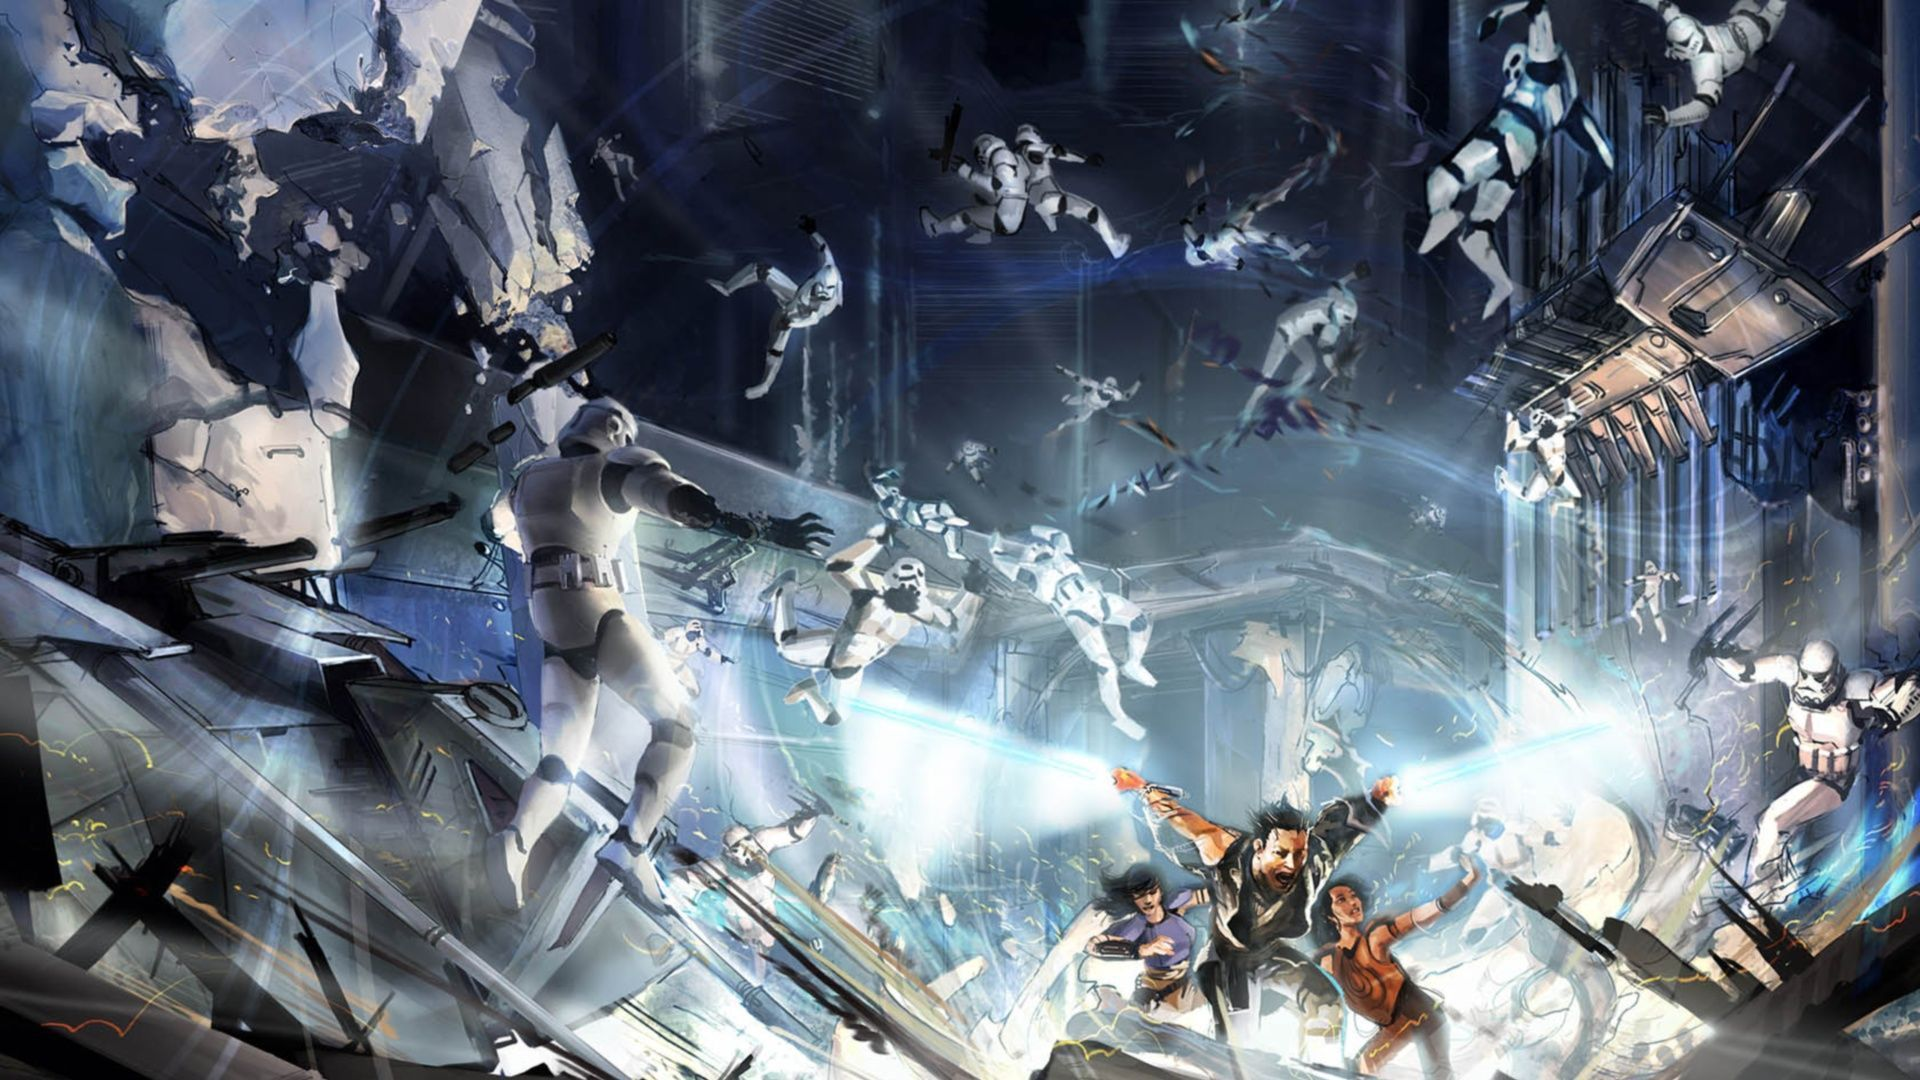 Star Wars Battles Wallpapers Wallpaper Cave